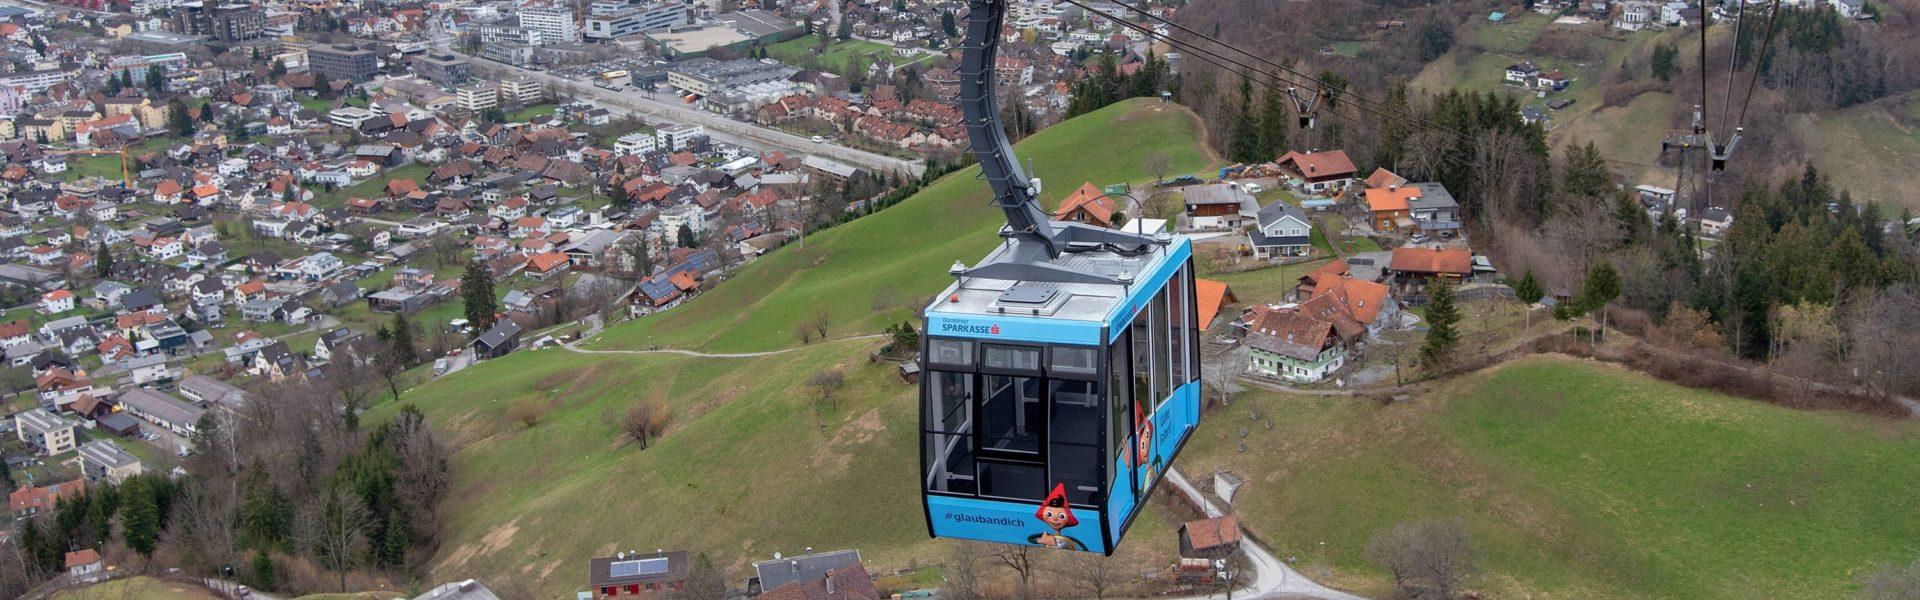 Karren On Top, Familienausflug Karren (c) Jürgen Kostelac / Dornbirner Seilbahn GmbH